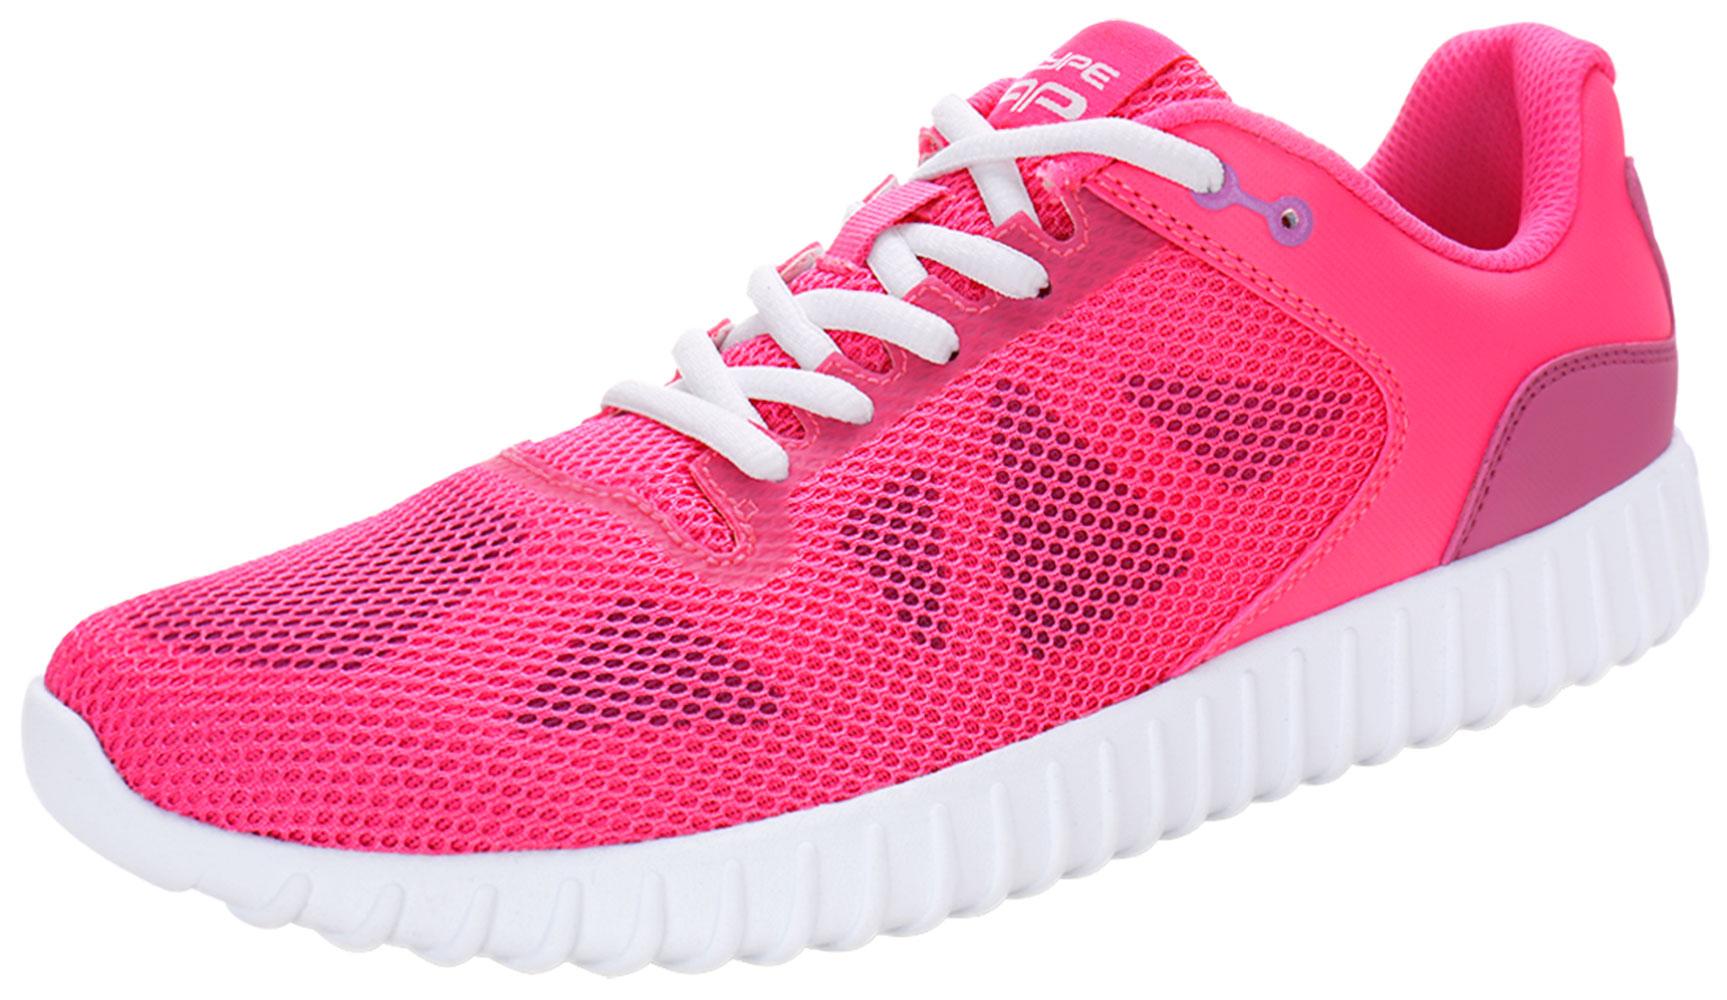 PYPE Women Geometric Prints Lace Up Mesh Training Shoes Pink US 10